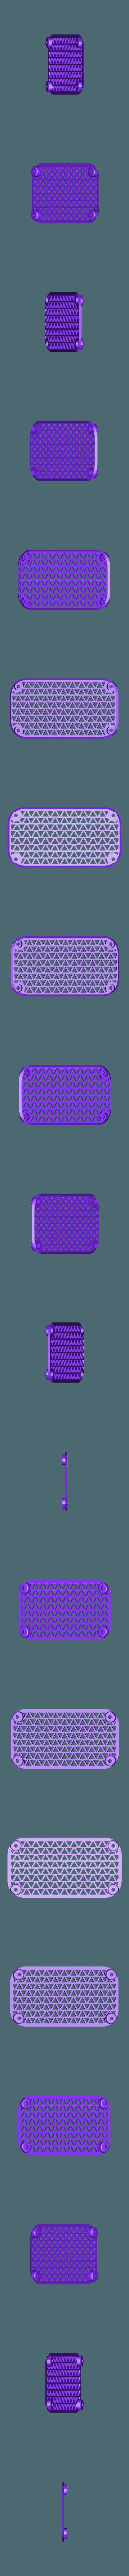 Front_mesh2.stl Download free STL file Mini Bluetooth Speaker • 3D printer design, EugenioFructuoso